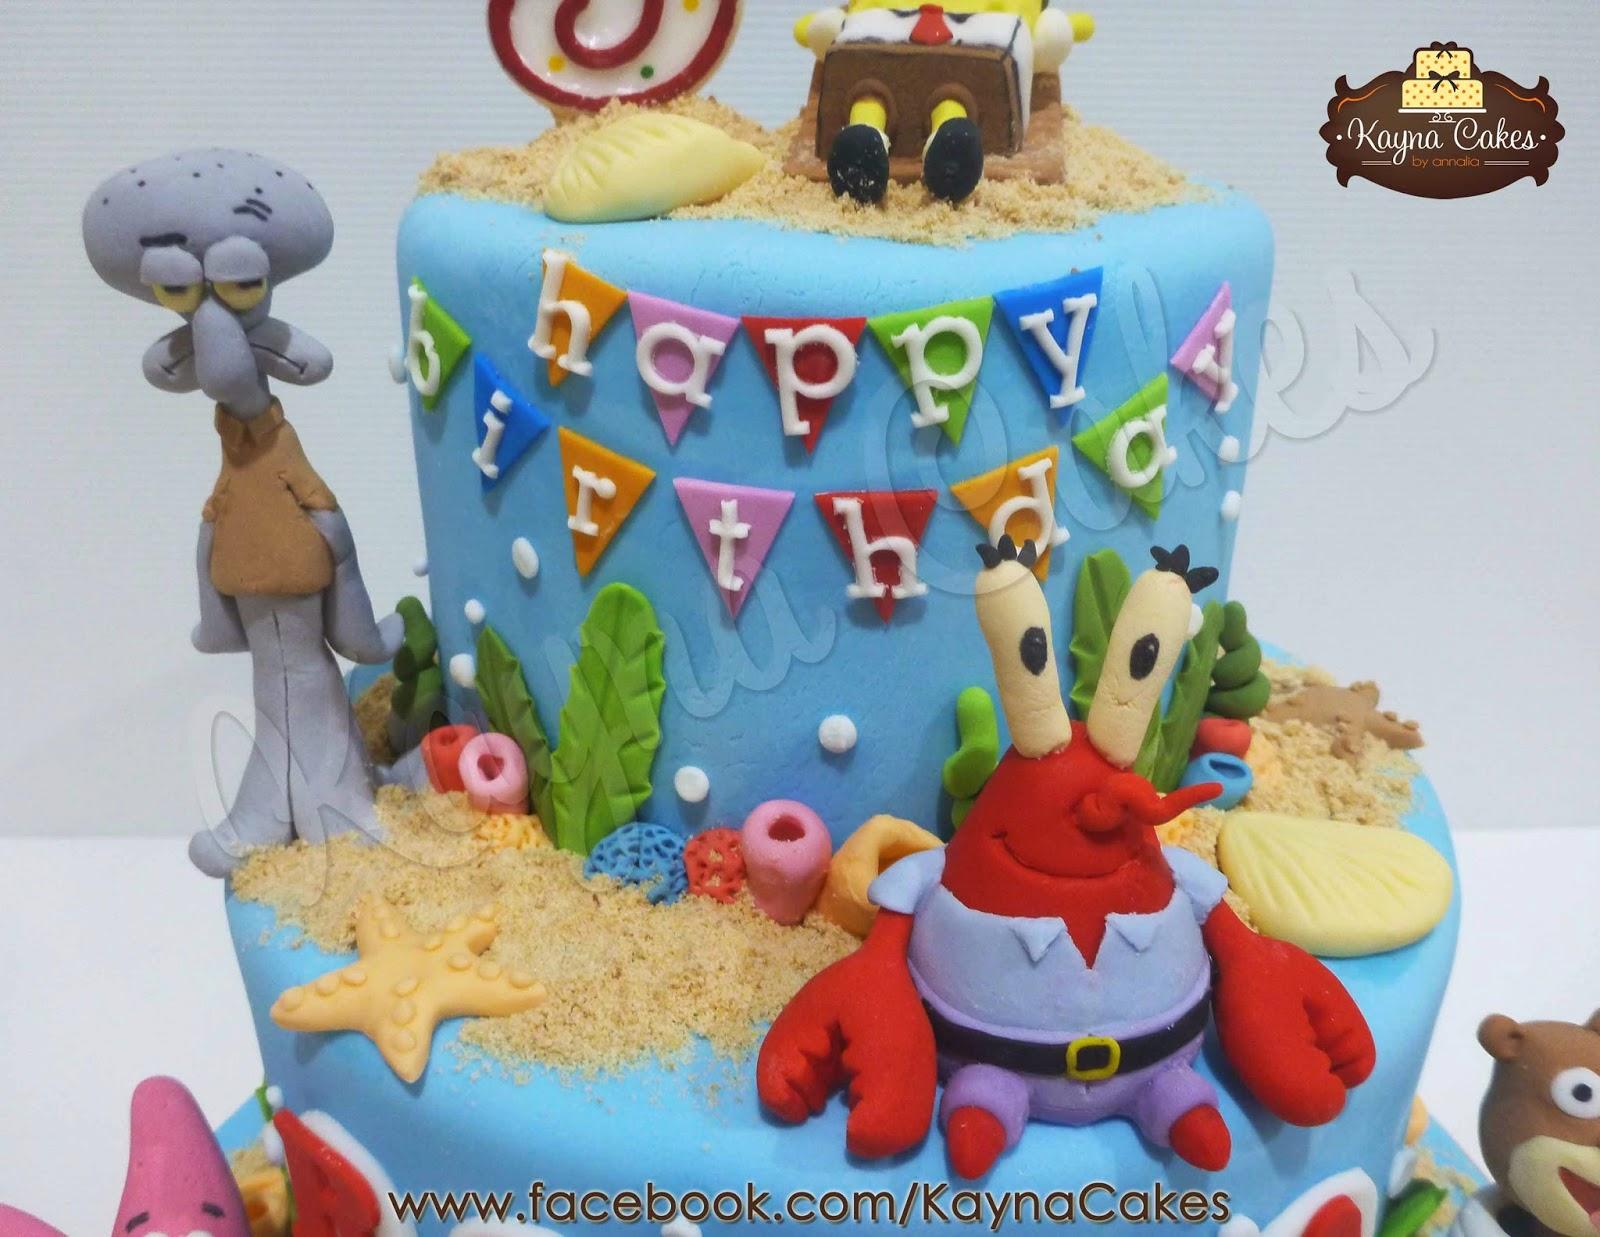 Spongebob Birthday Cake 3 Tier Spongebob Squidward And